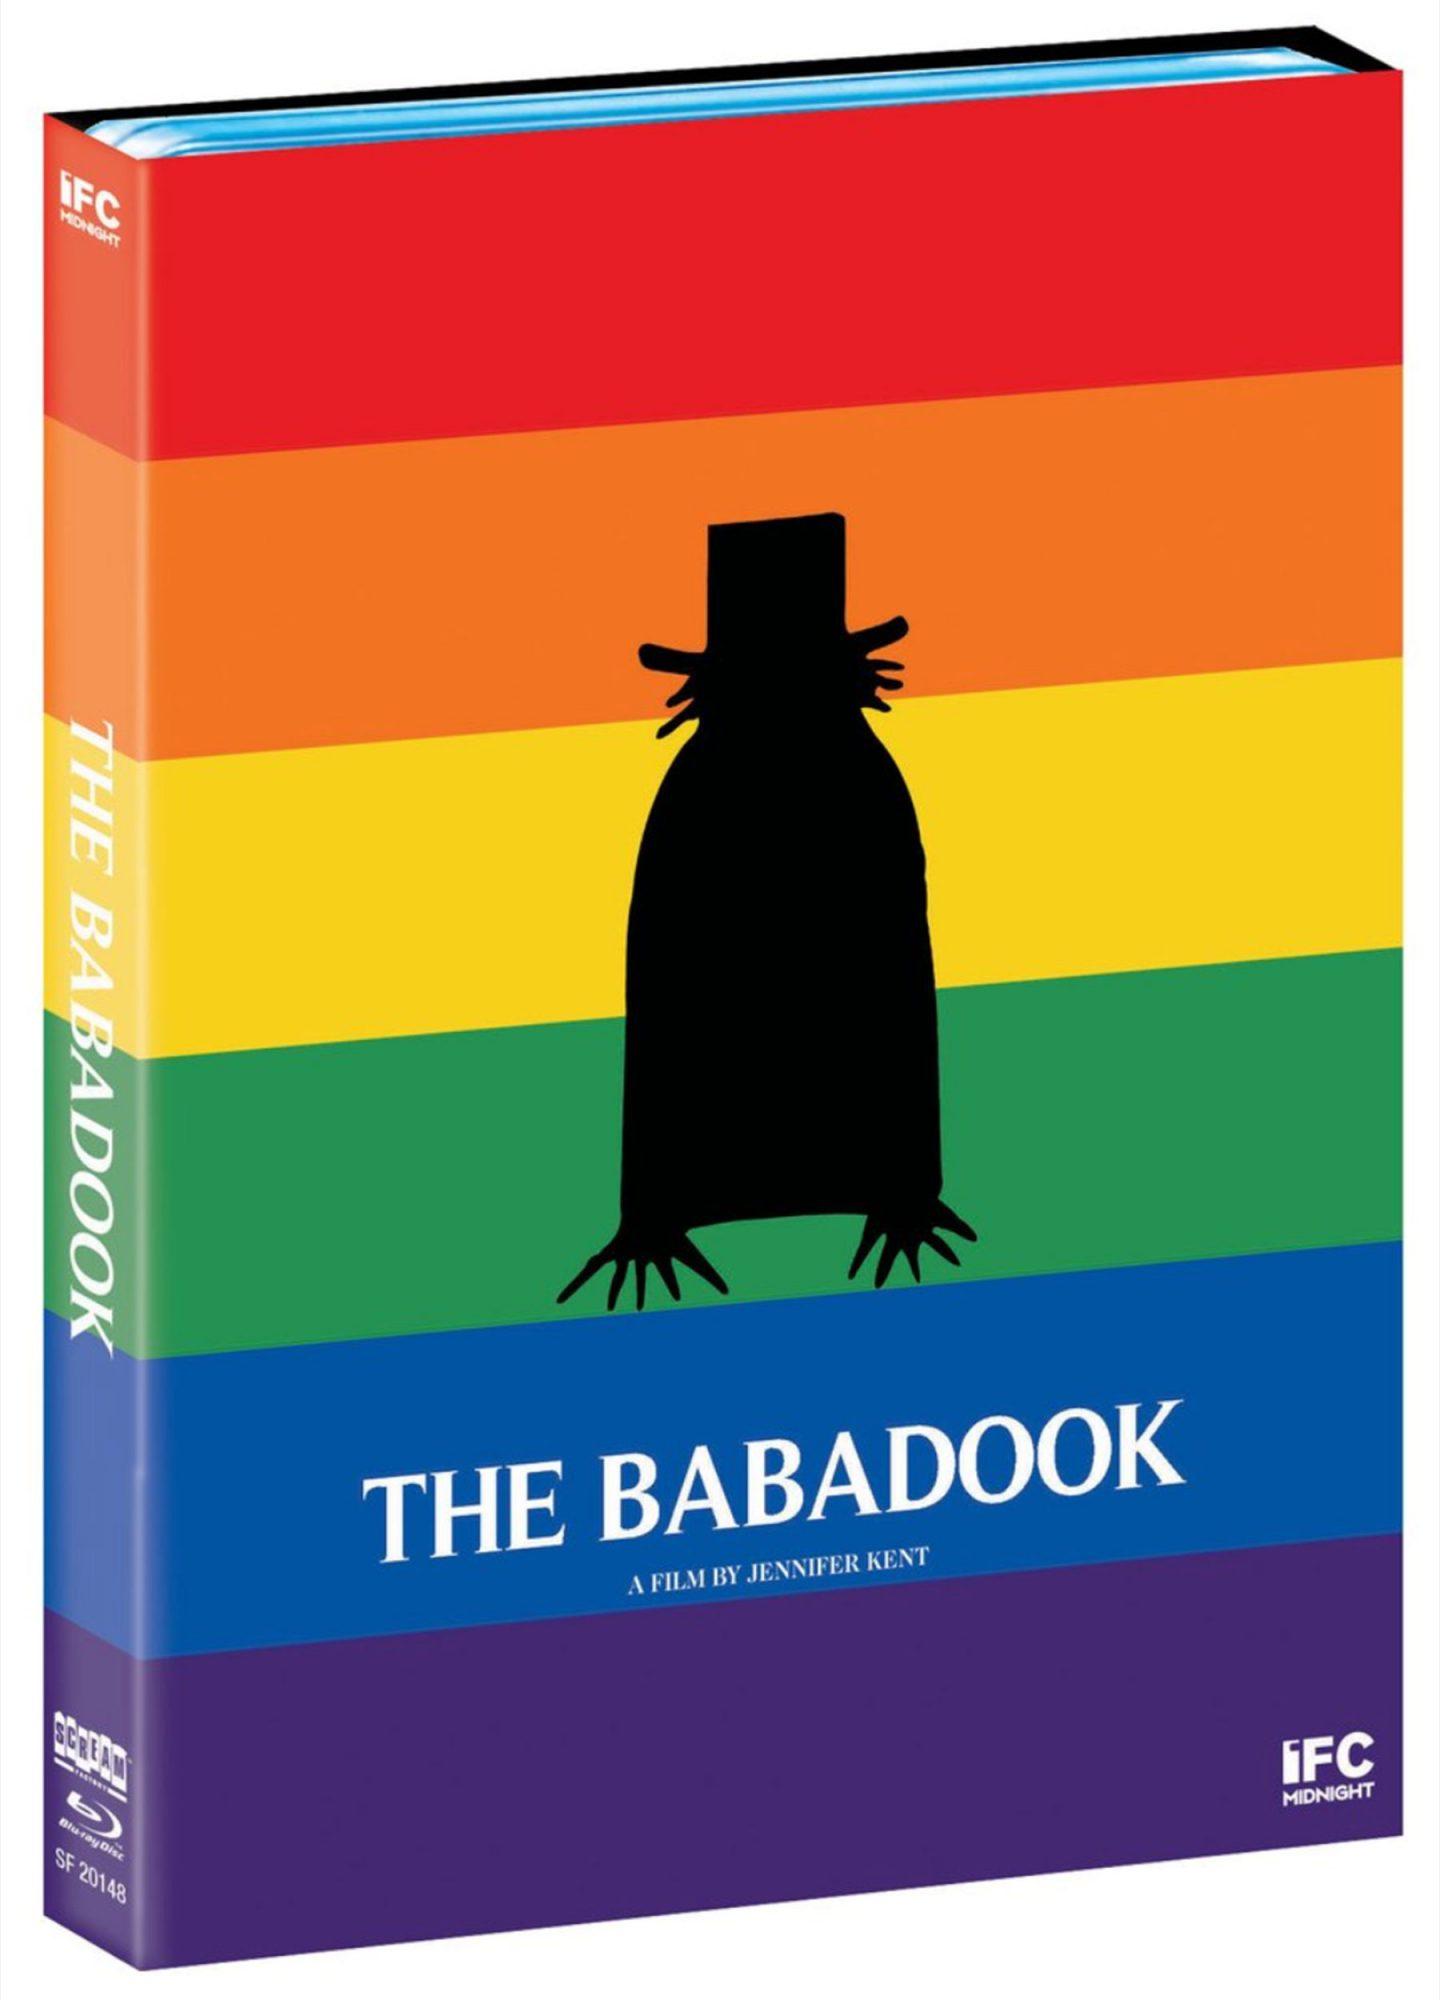 The Babadook LGBTQ Pride Edition Blu-Ray